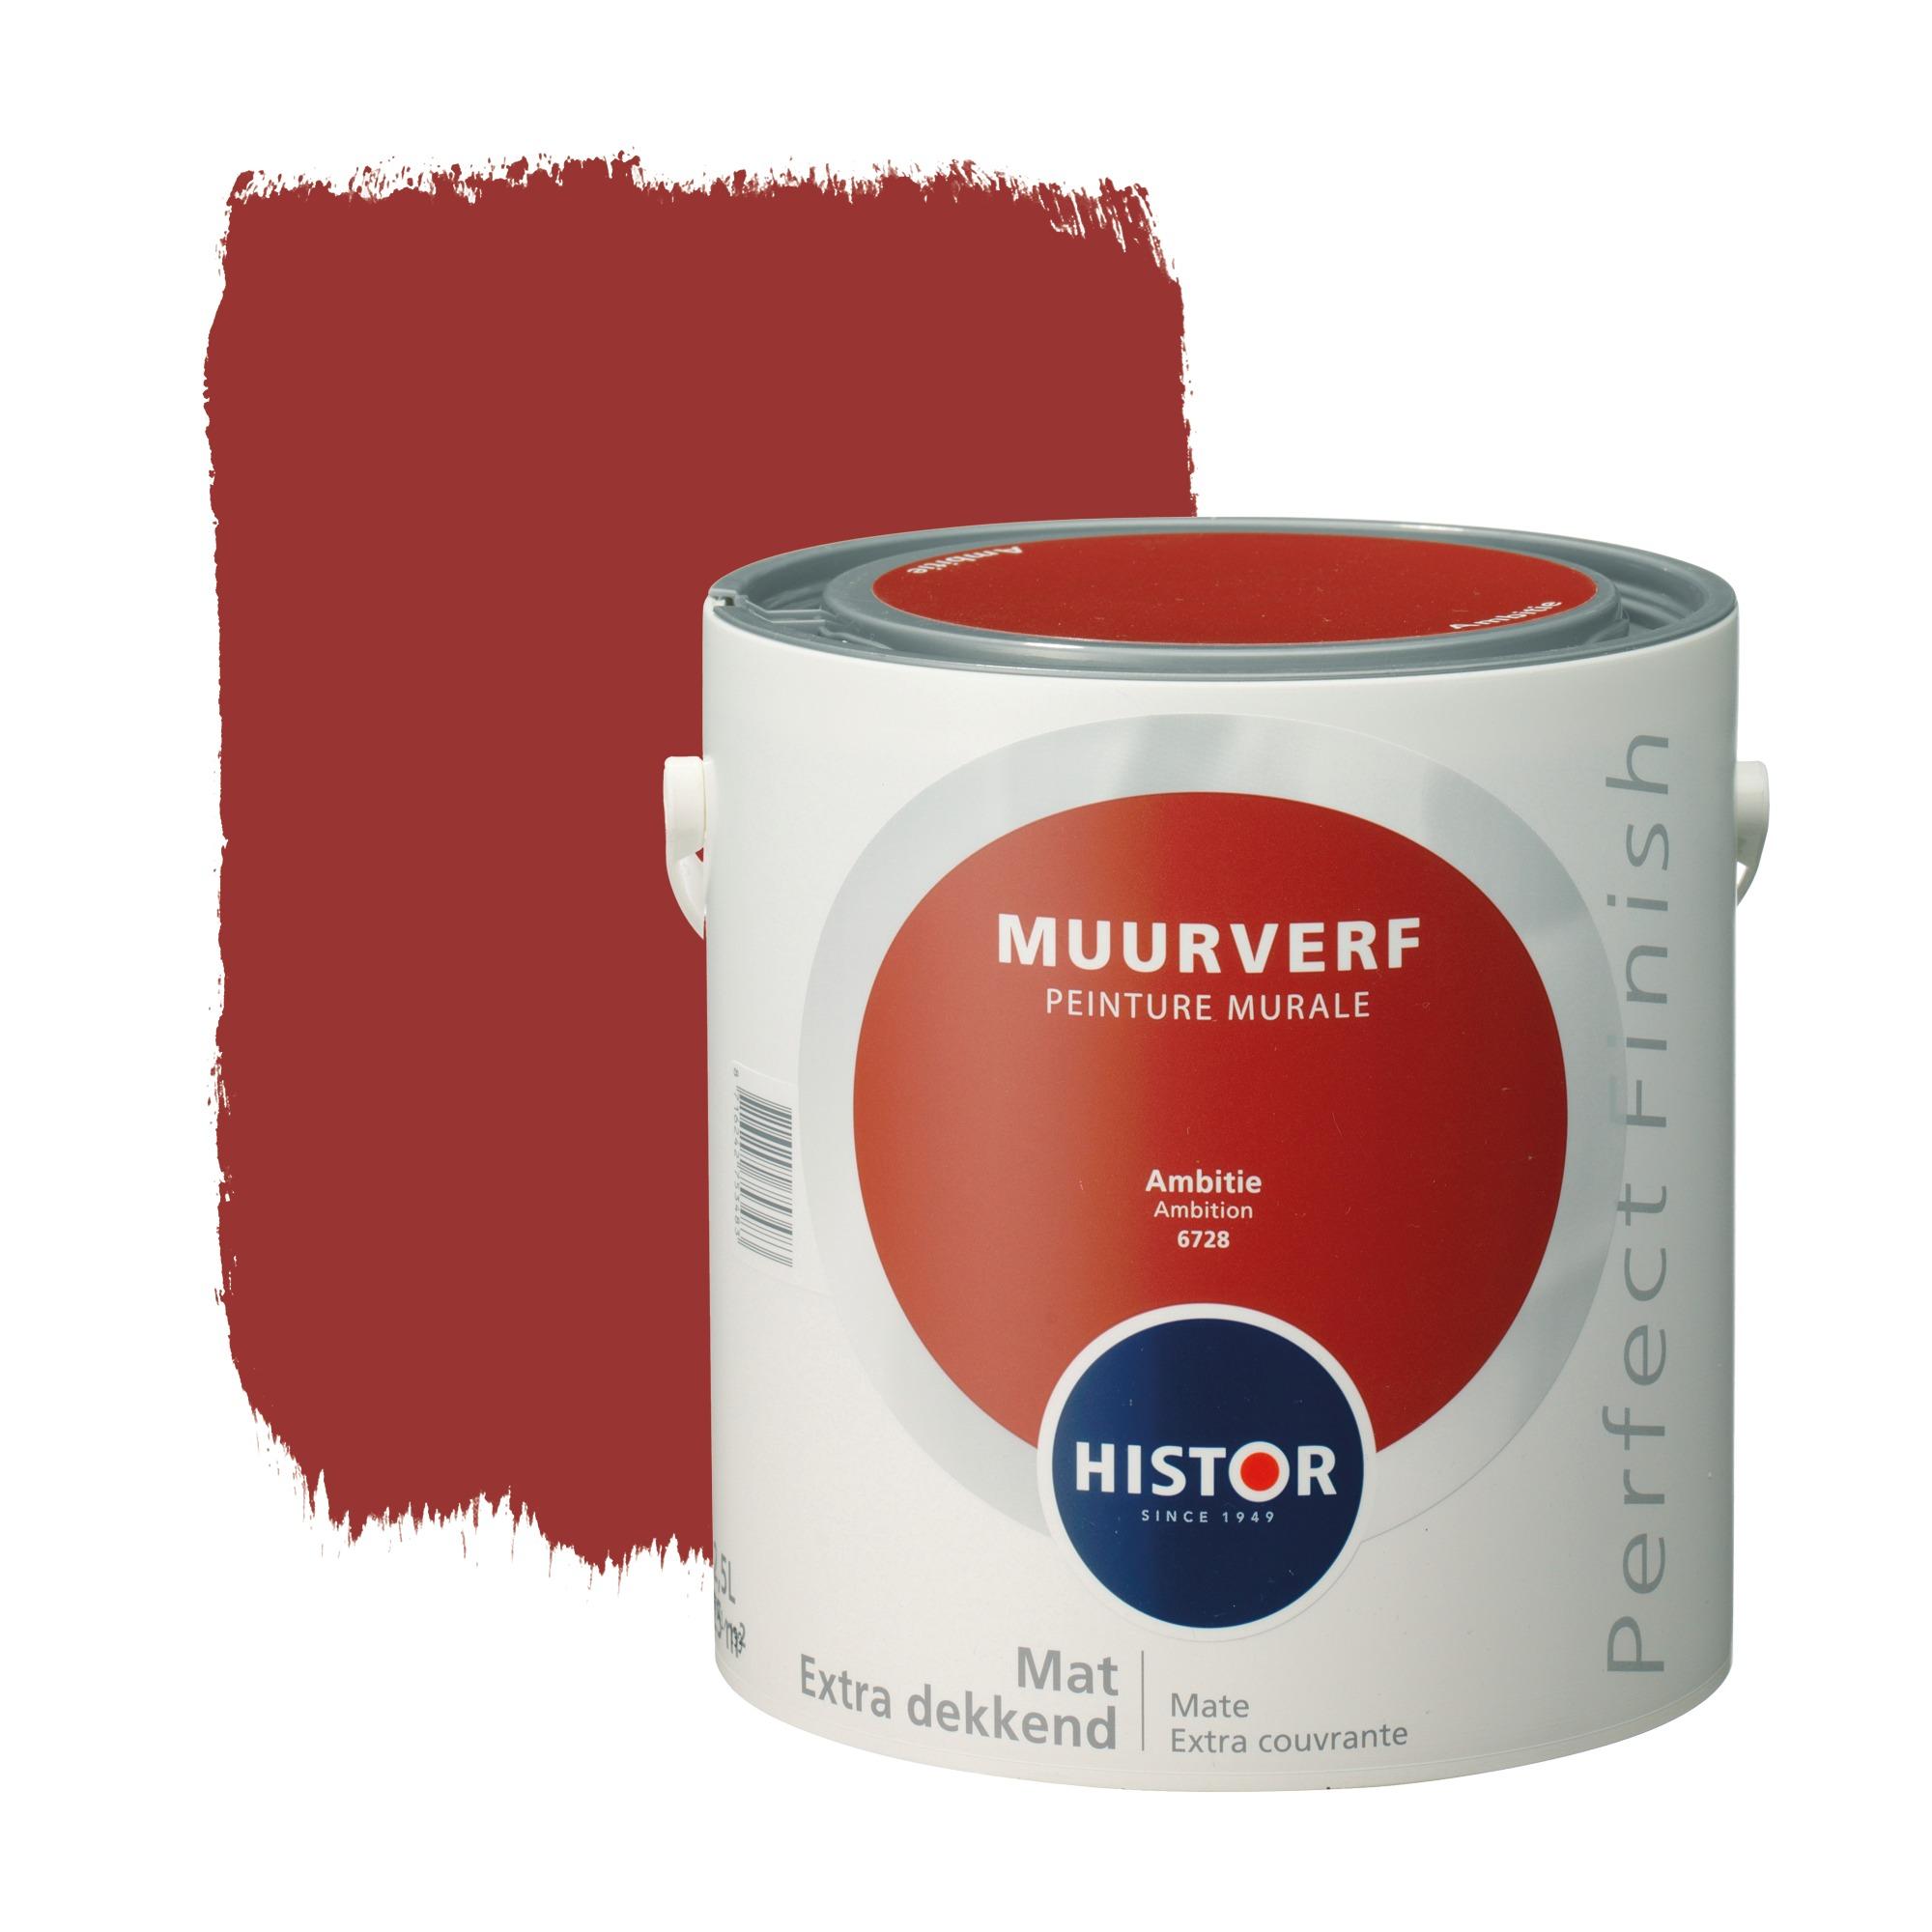 Histor perfect finish muurverf mat ambitie 6728 2,5 l